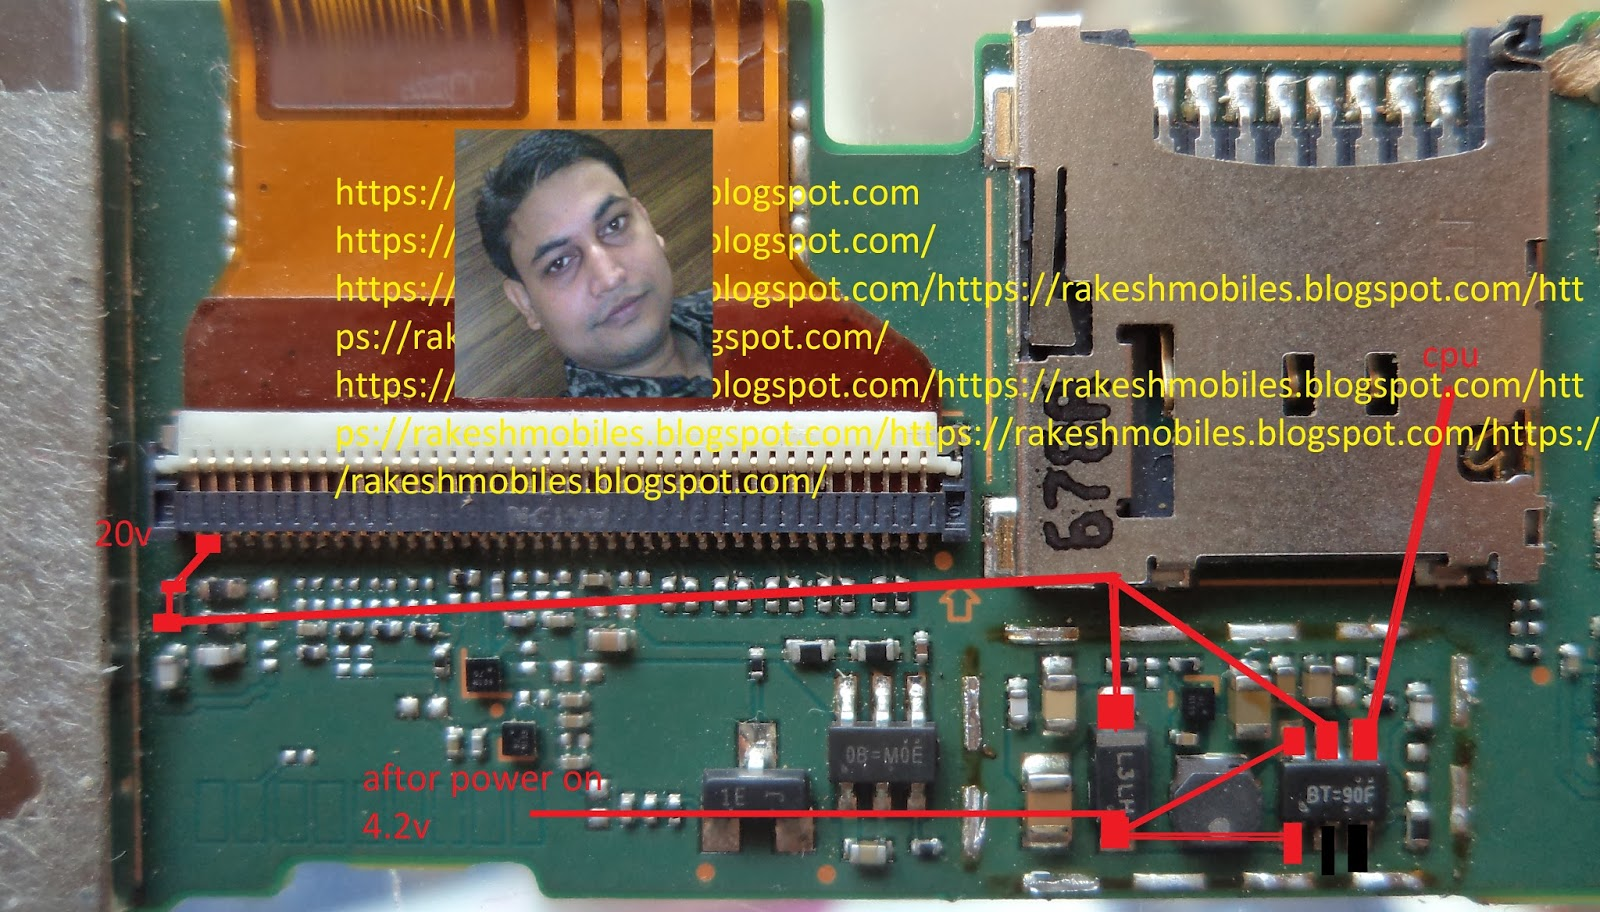 huawei t1-701u light solution   Mobile Repairing Tips